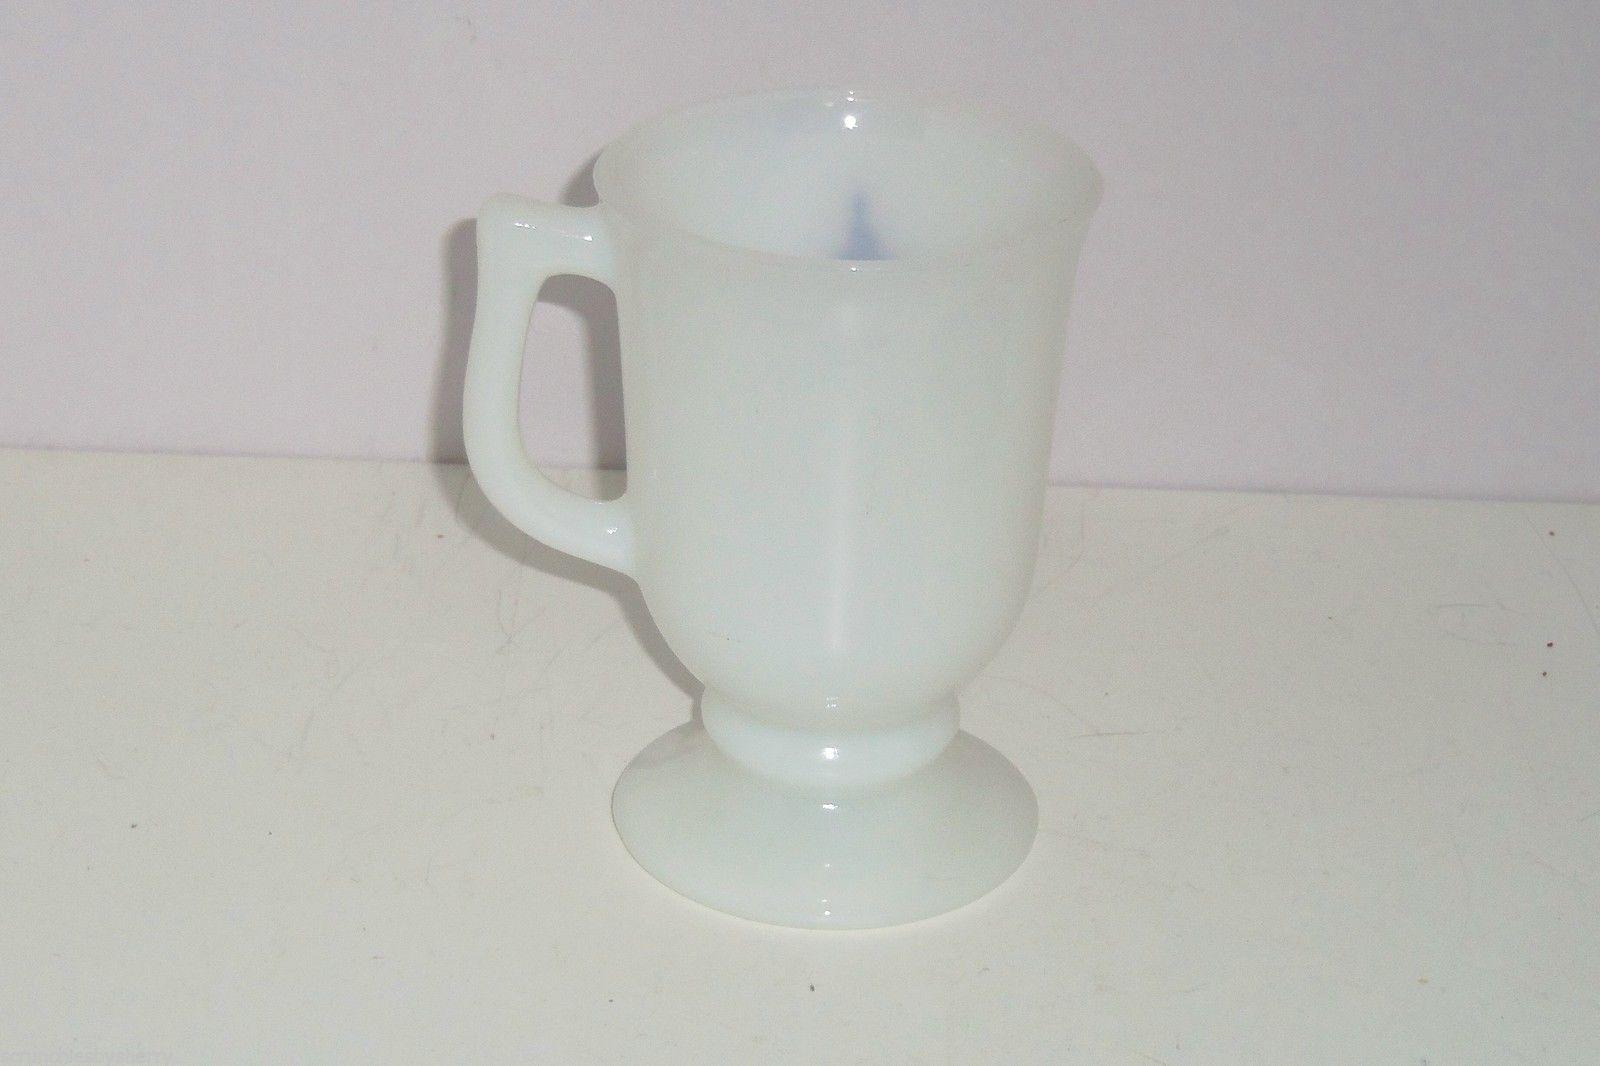 Walt Disney Productions Coffee Mug World White Glass Footed Barbara Vintage image 2